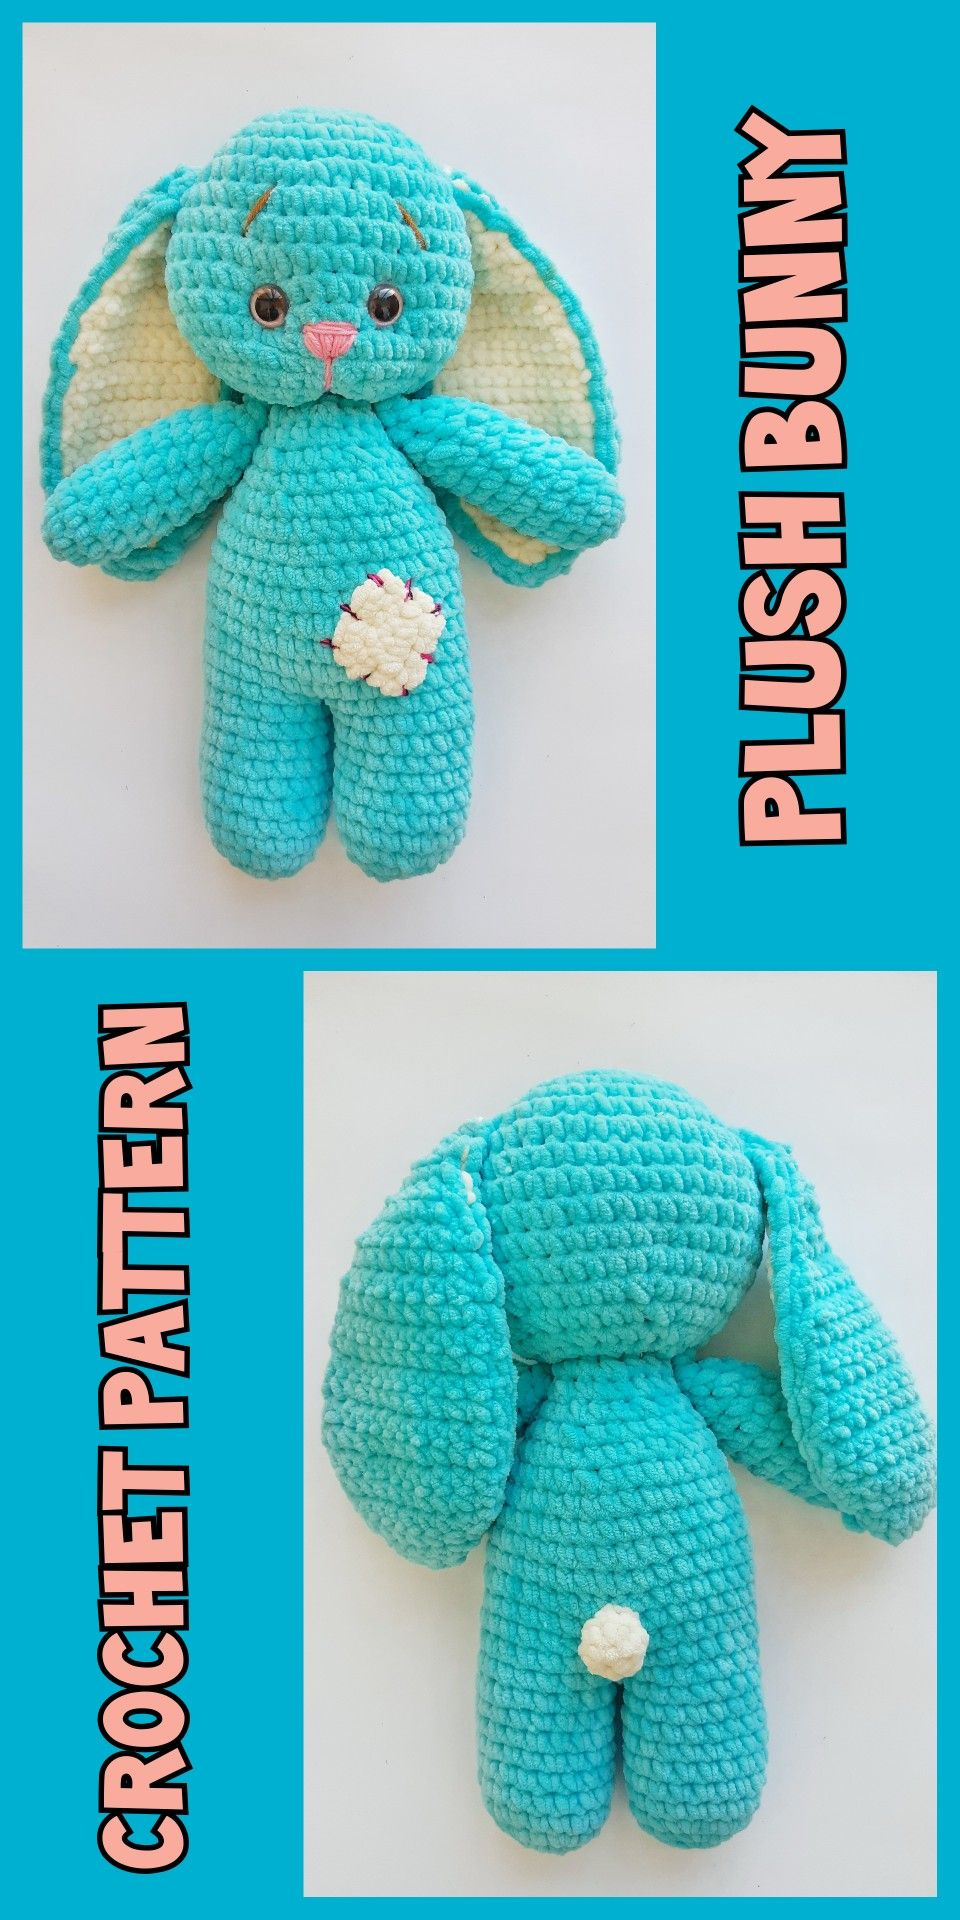 Amigurumi Bunny Free Crochet Patterns - Page 2 of 2 - Crochet ... | 1920x960